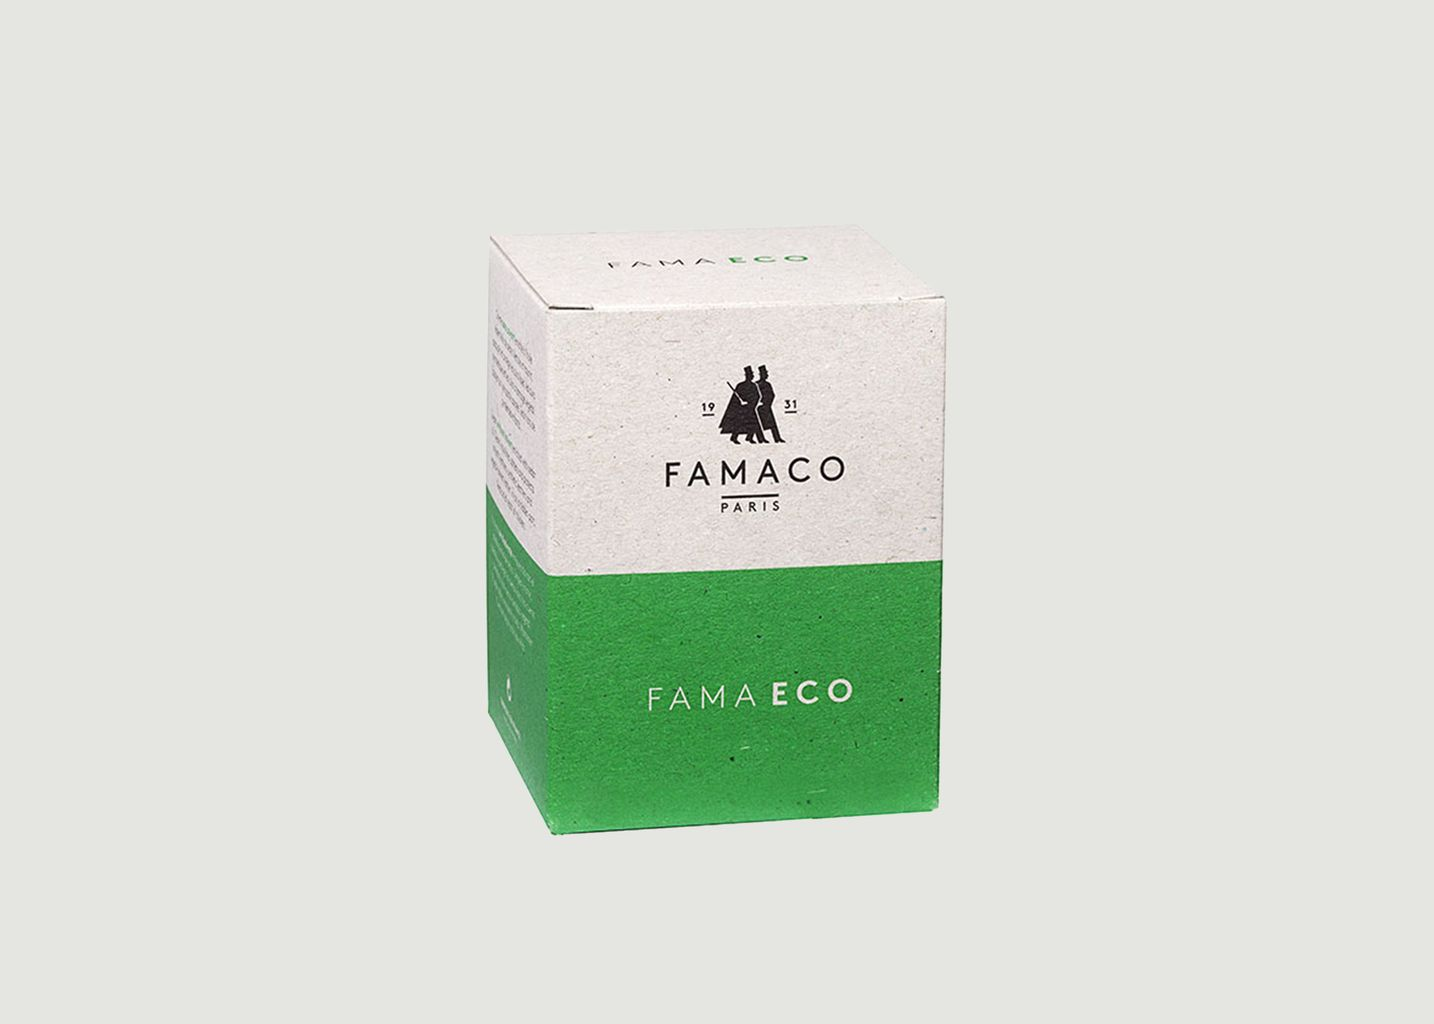 Fama Eco 50ml - Famaco Paris